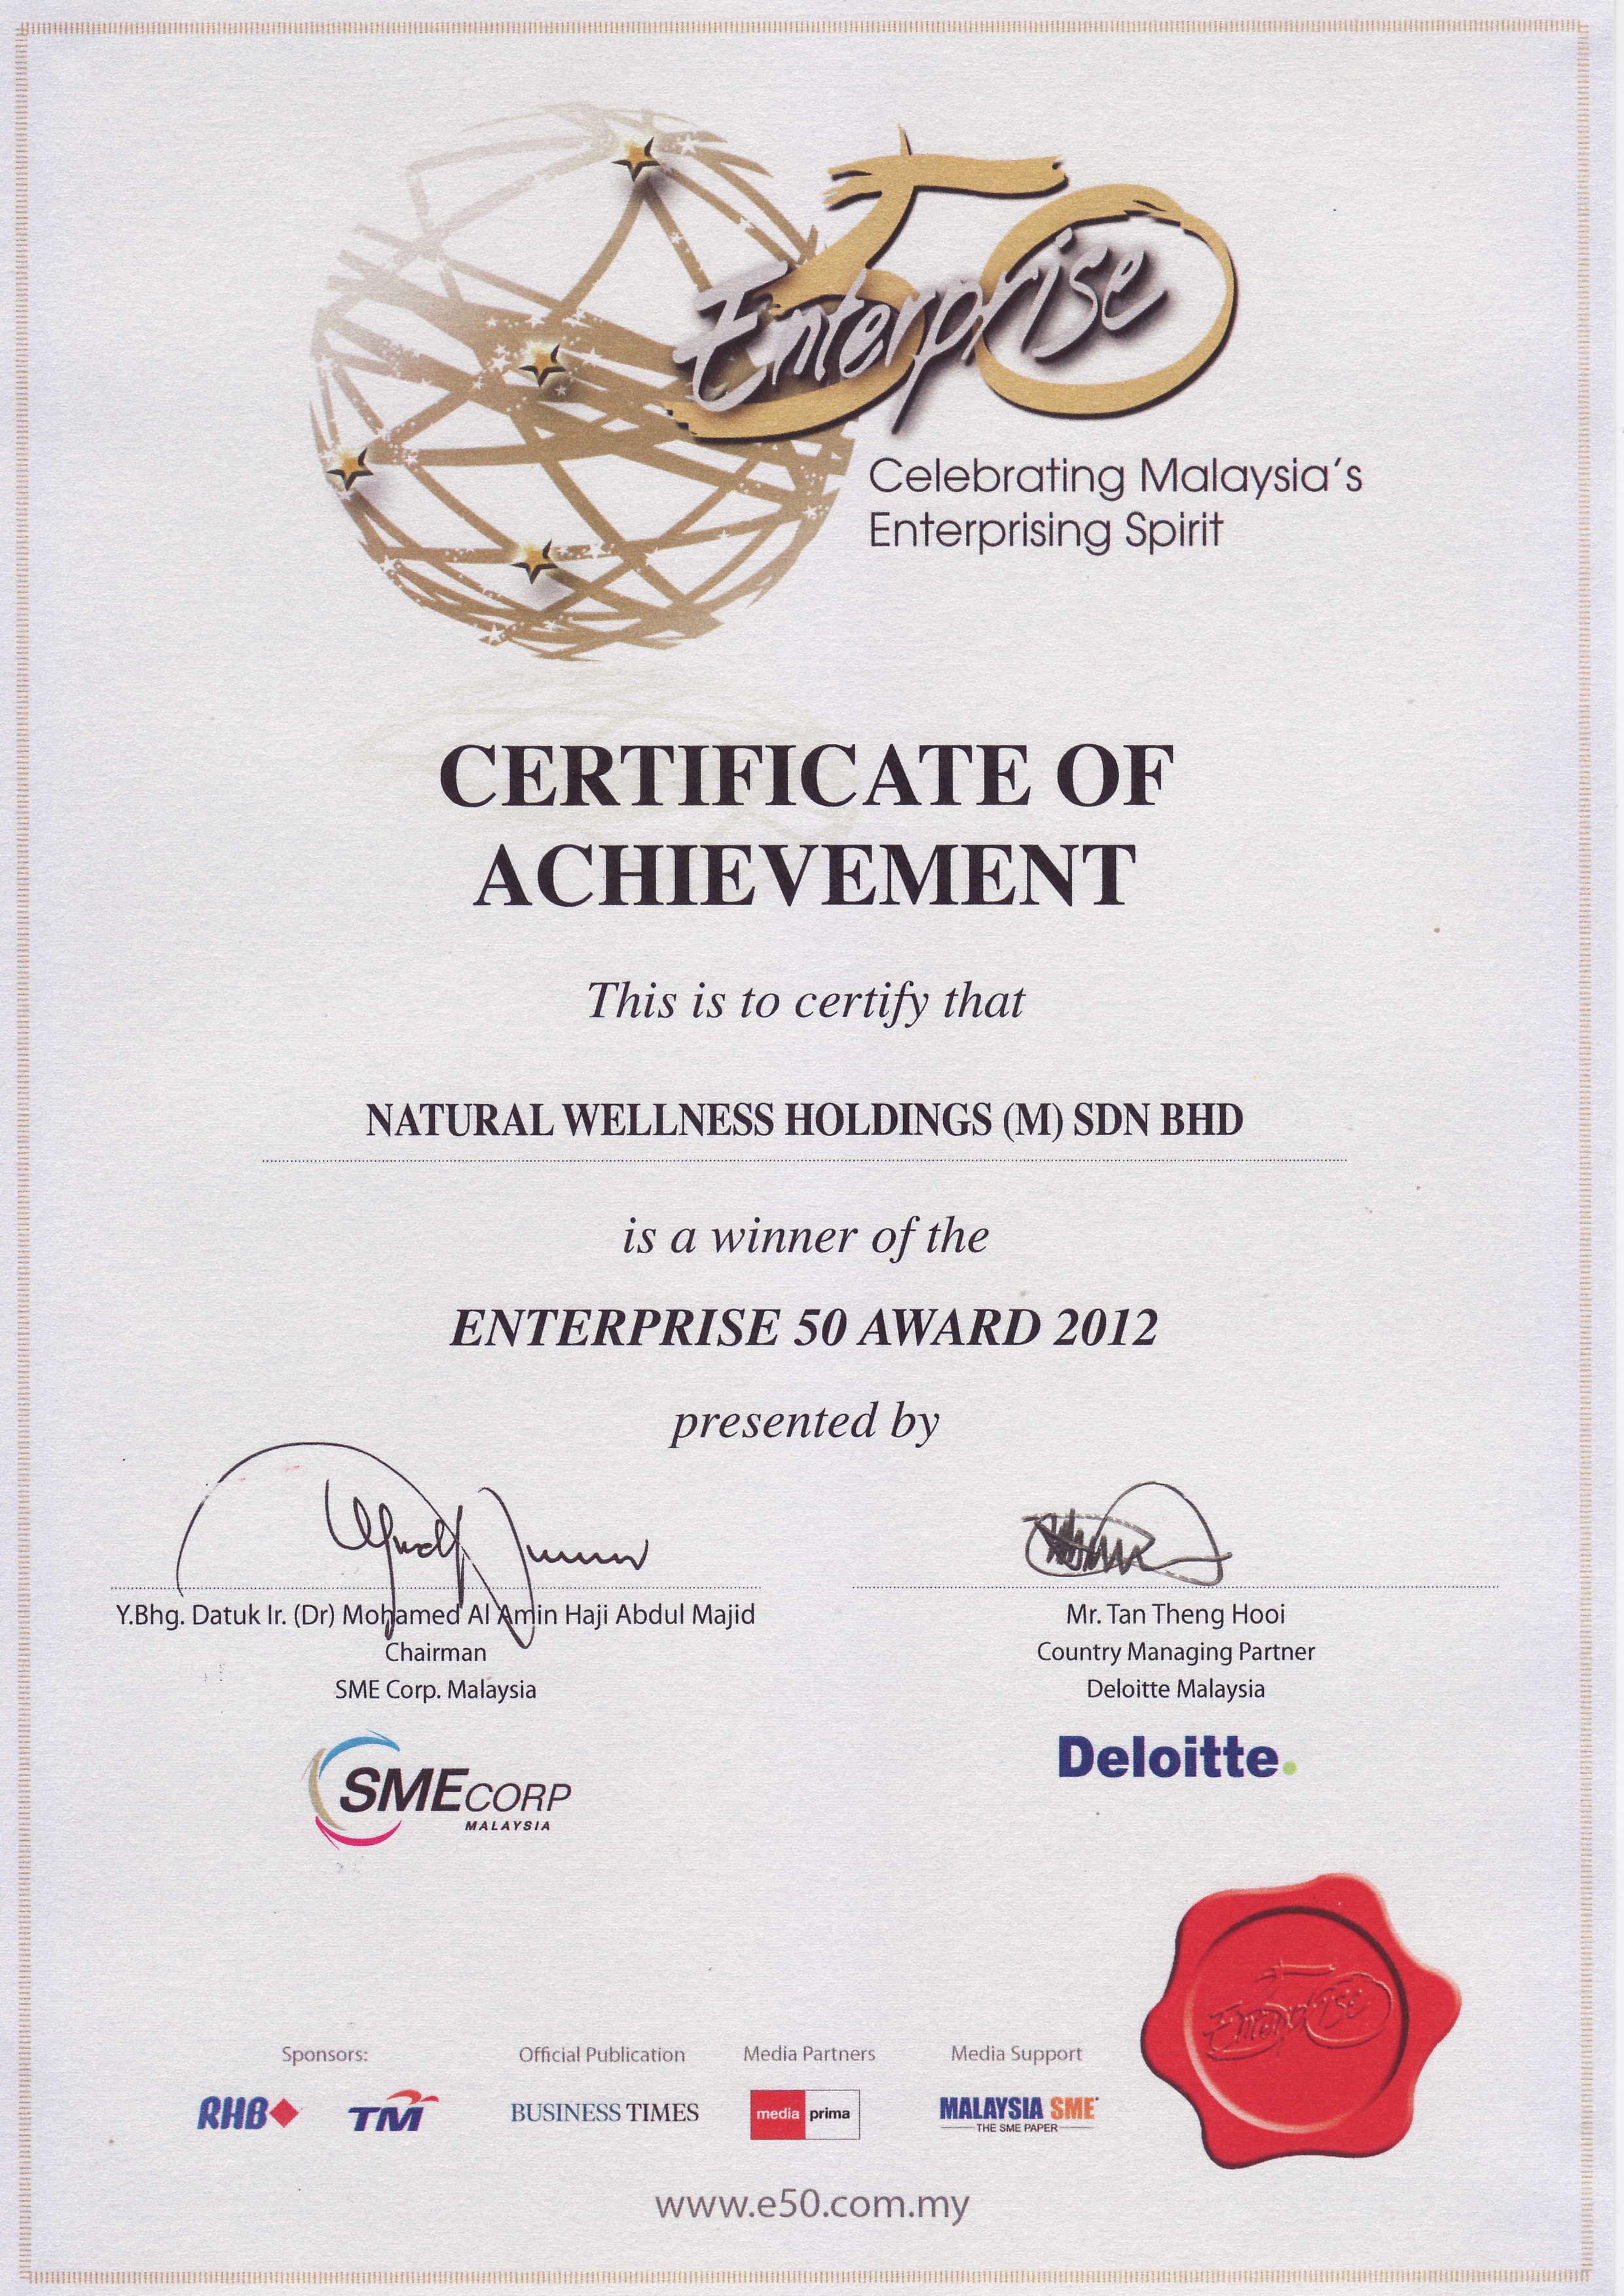 natural wellness holdings m sdn bhd